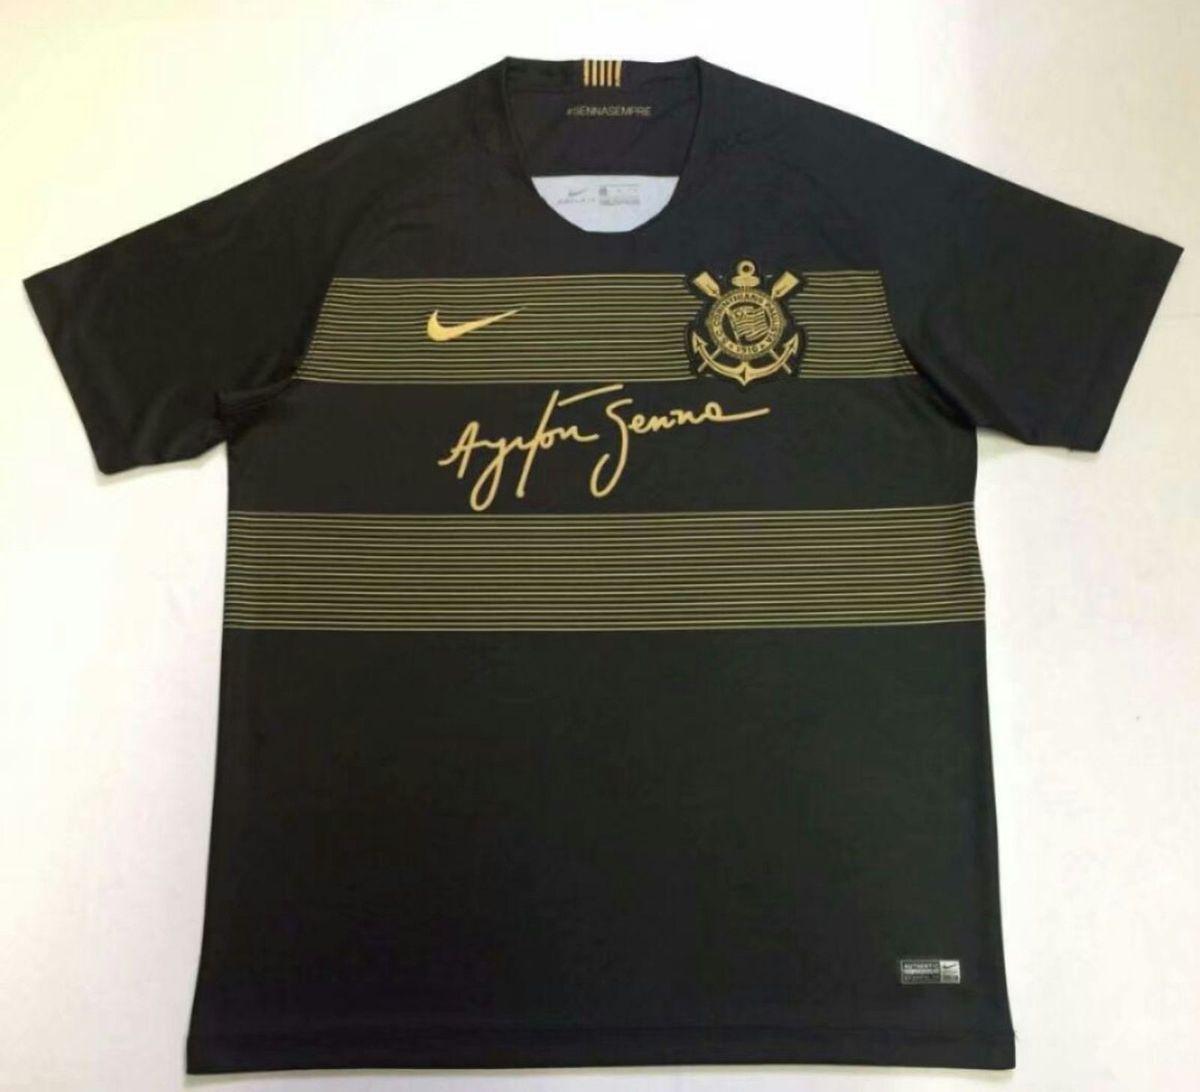 camisa do corinthians ayrton senna importada pronta entrega - esportes nike 14c54d3d8b5ae